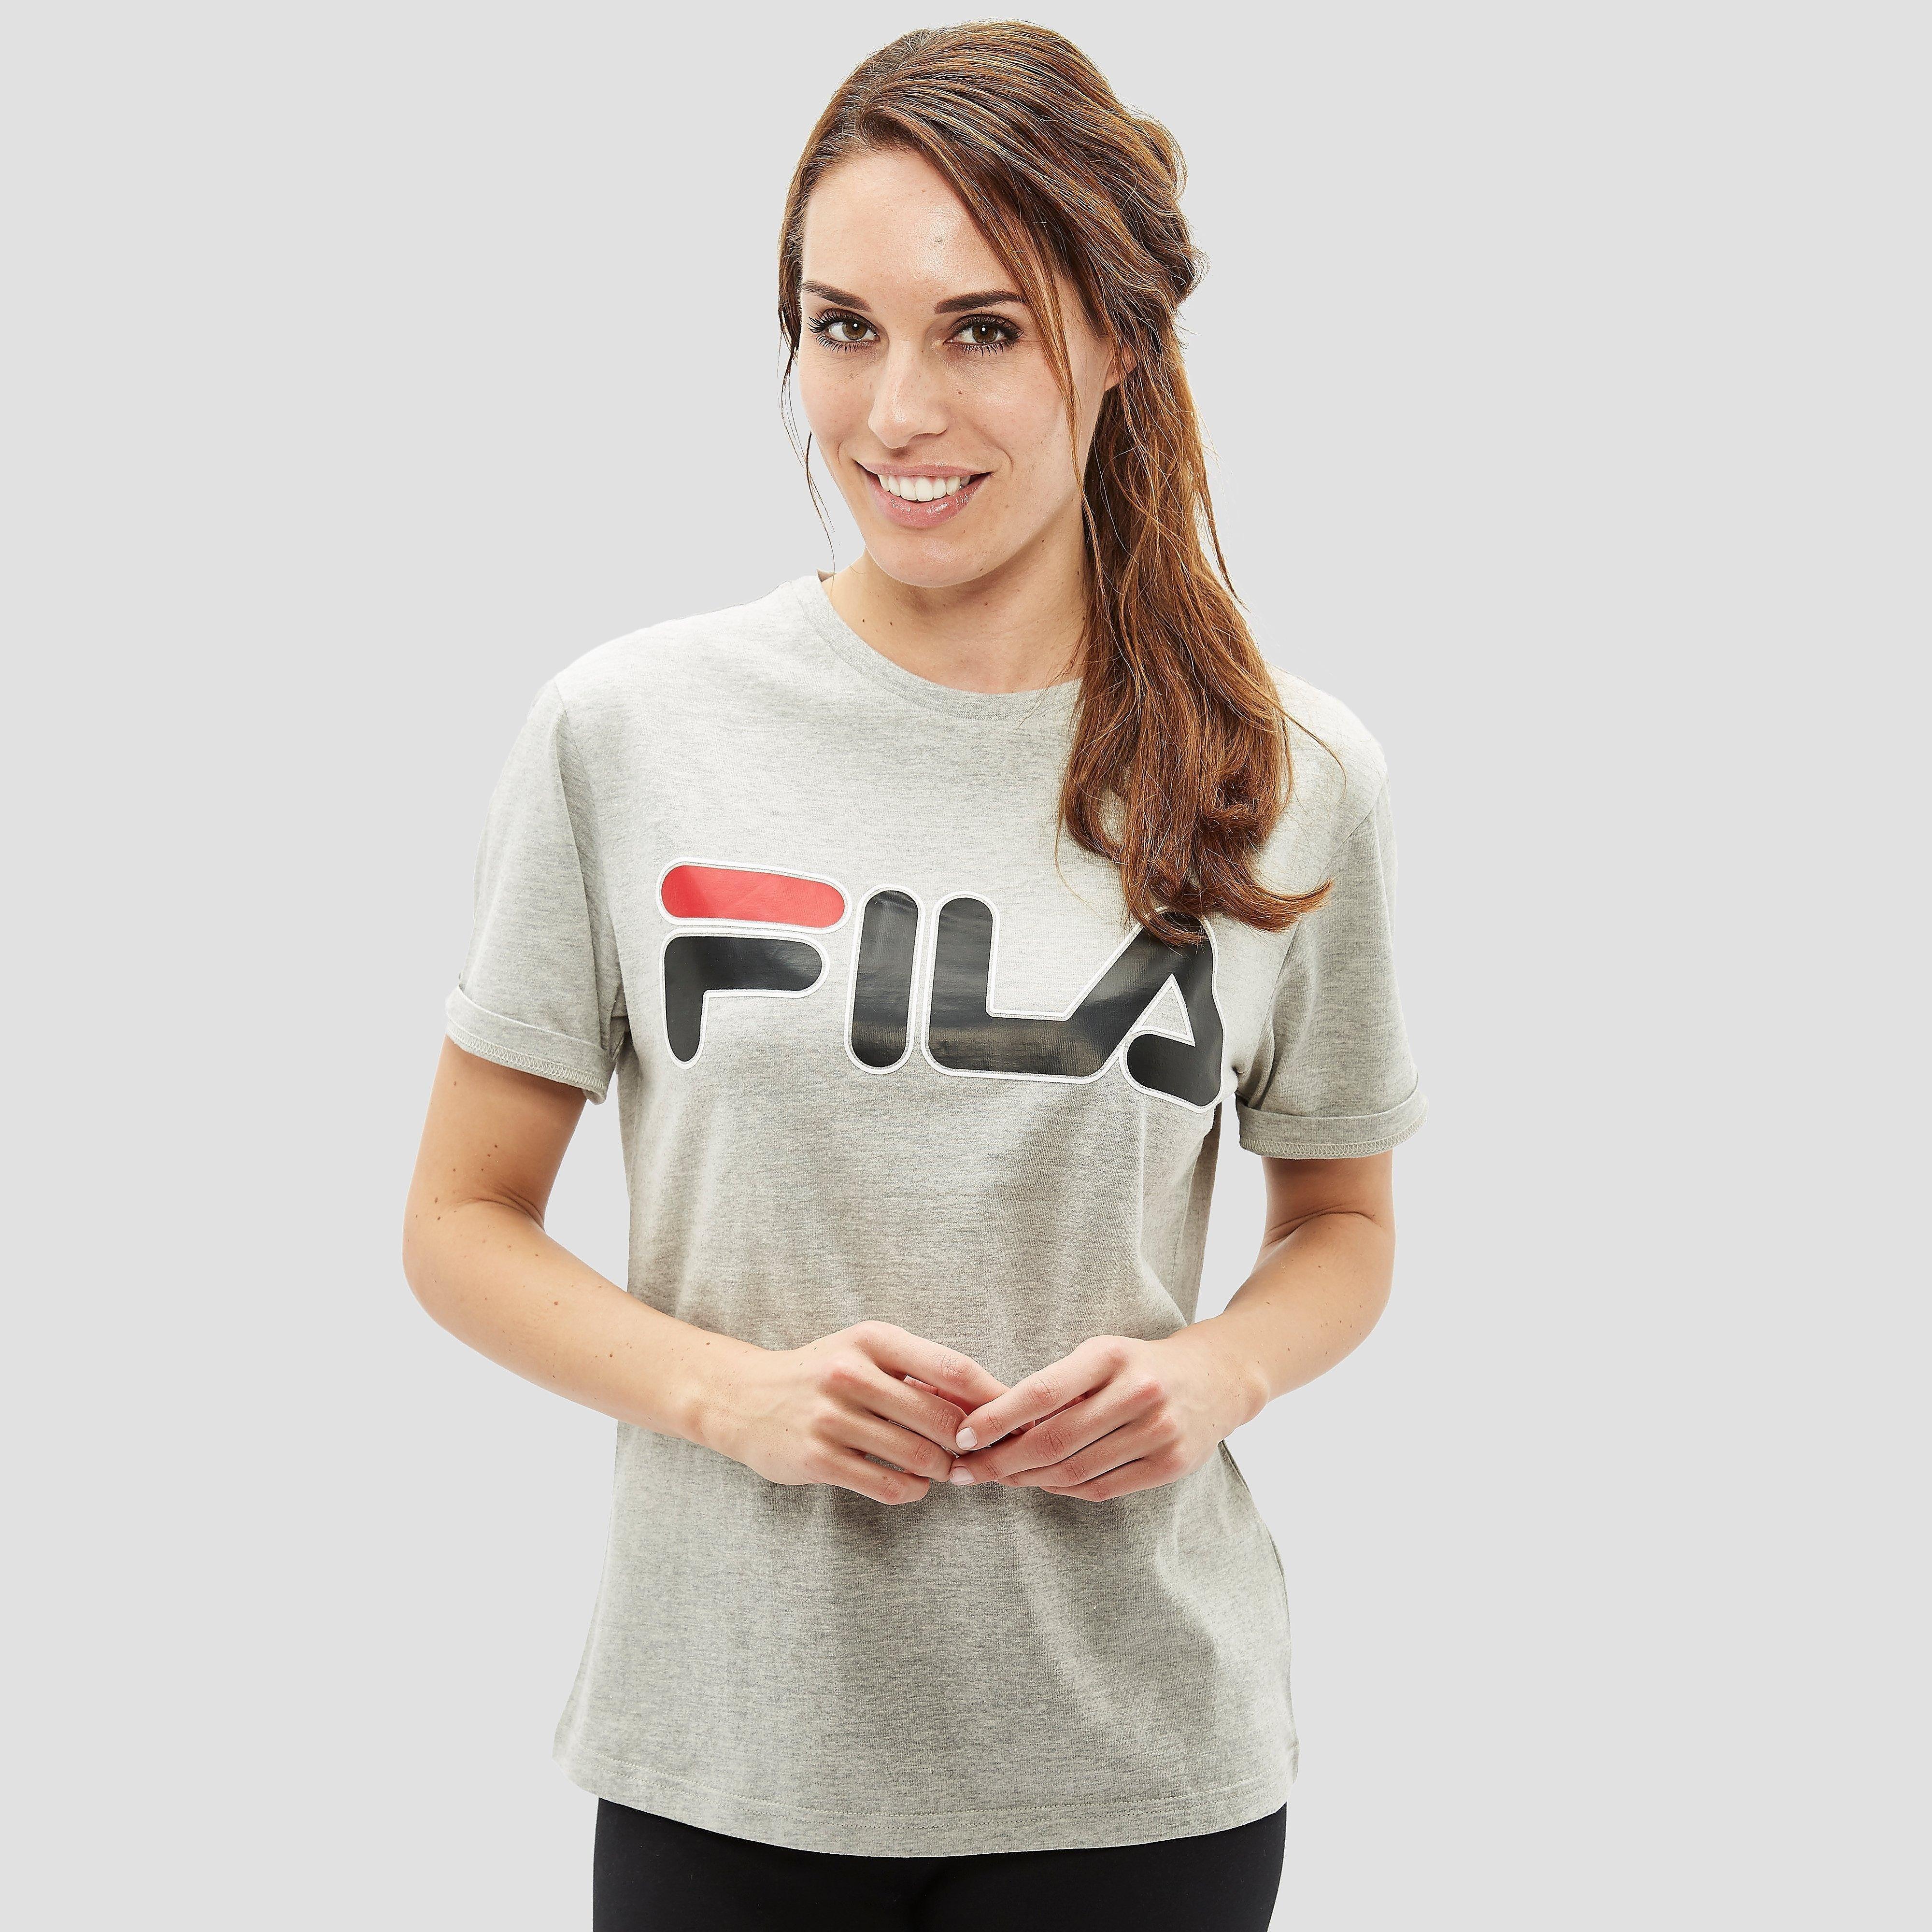 FILA Giulia shirt grijs daes Dames